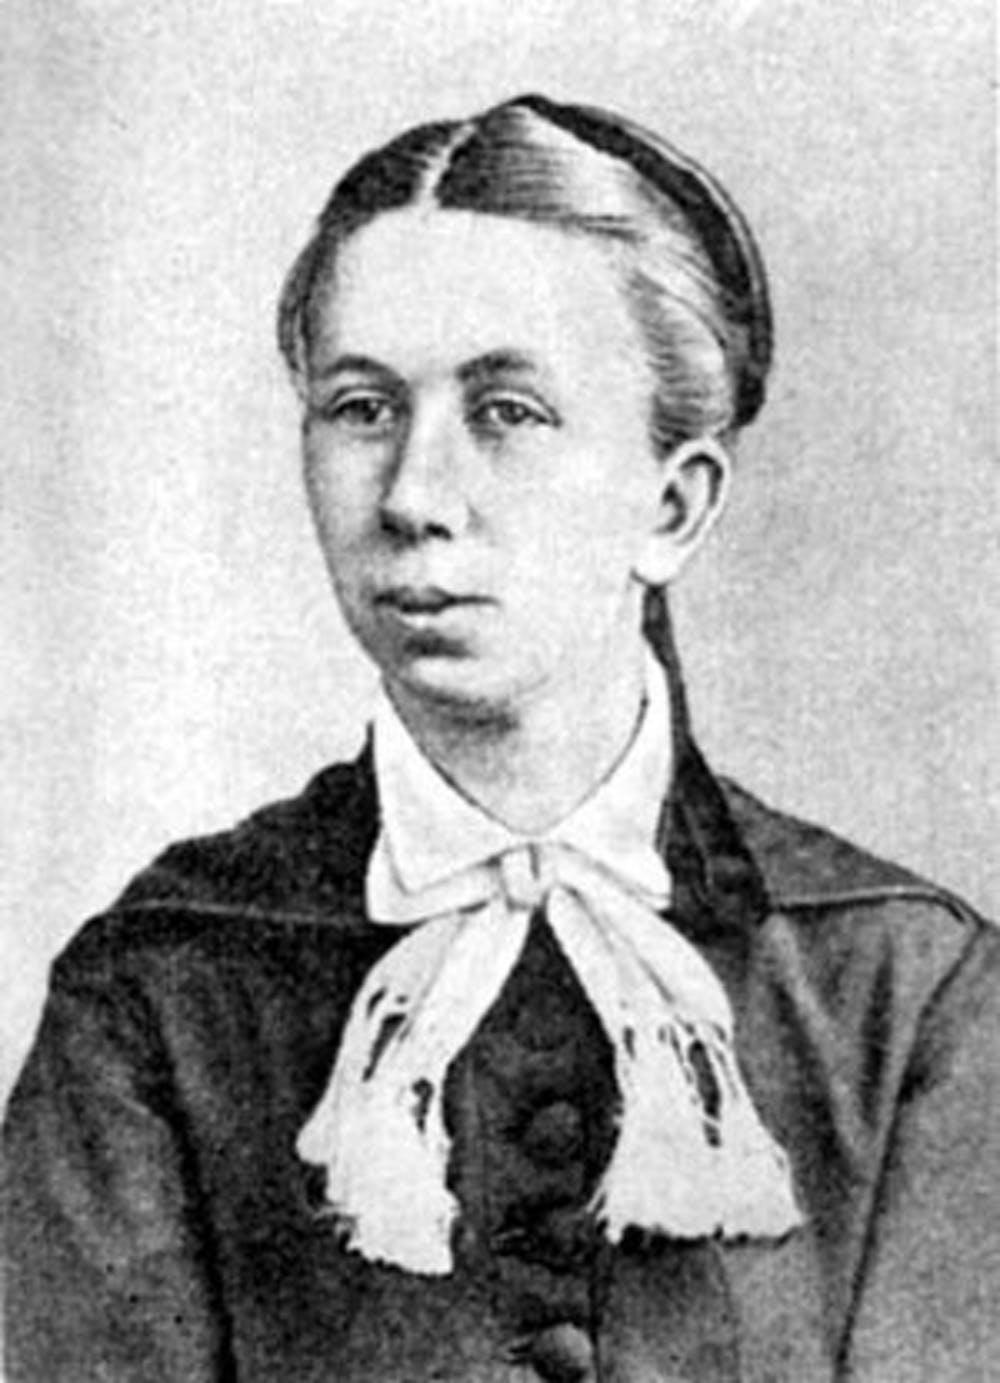 Julia Lermontova (1847-1919)